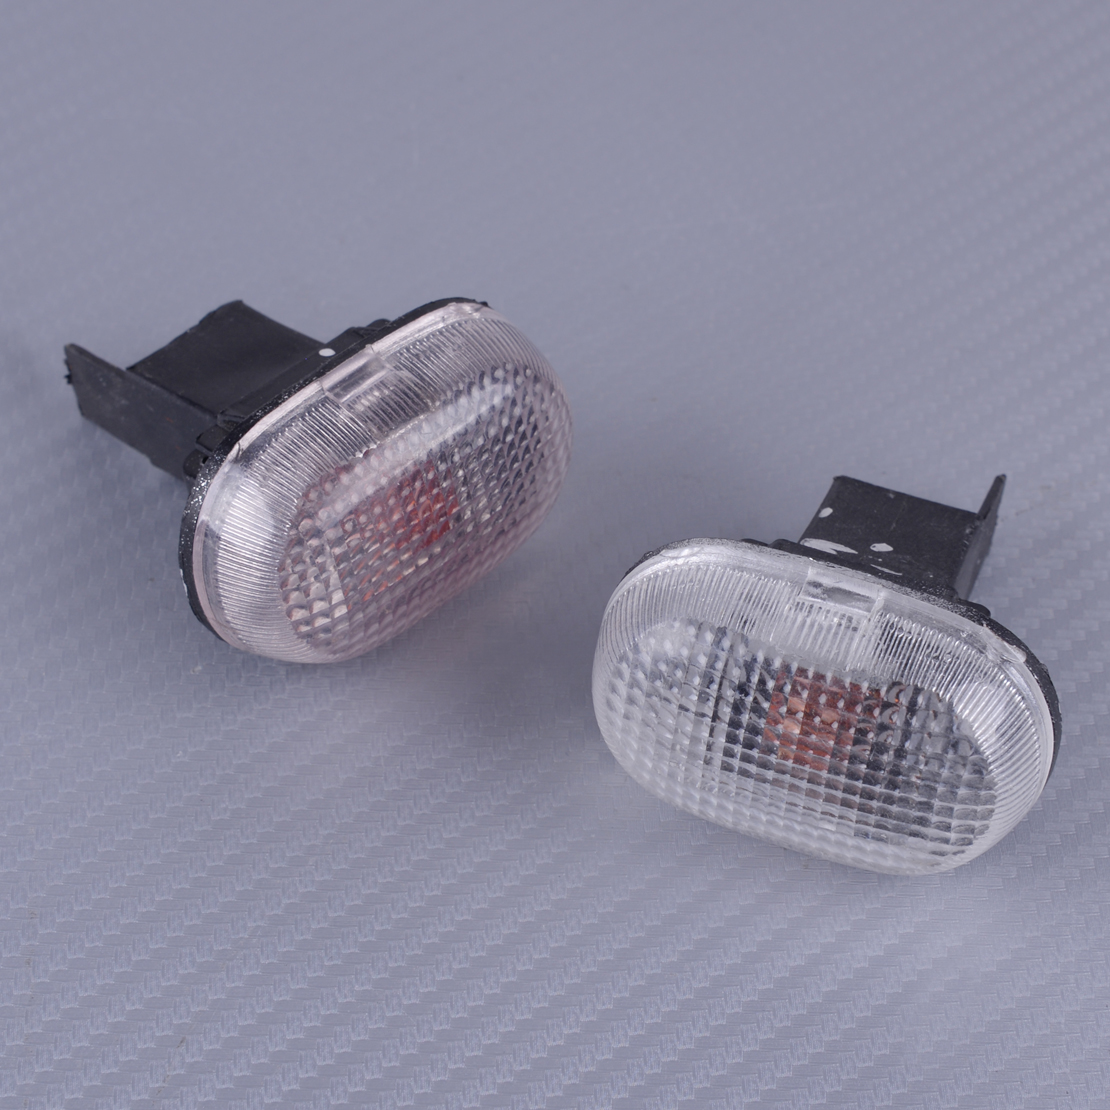 DWCX 2pcs Car Left Right Side Fender Lamp Light Signal Marker fit for Suzuki Cultus Swift MK2 1990-2000 2001 2002 2003 2004 2005